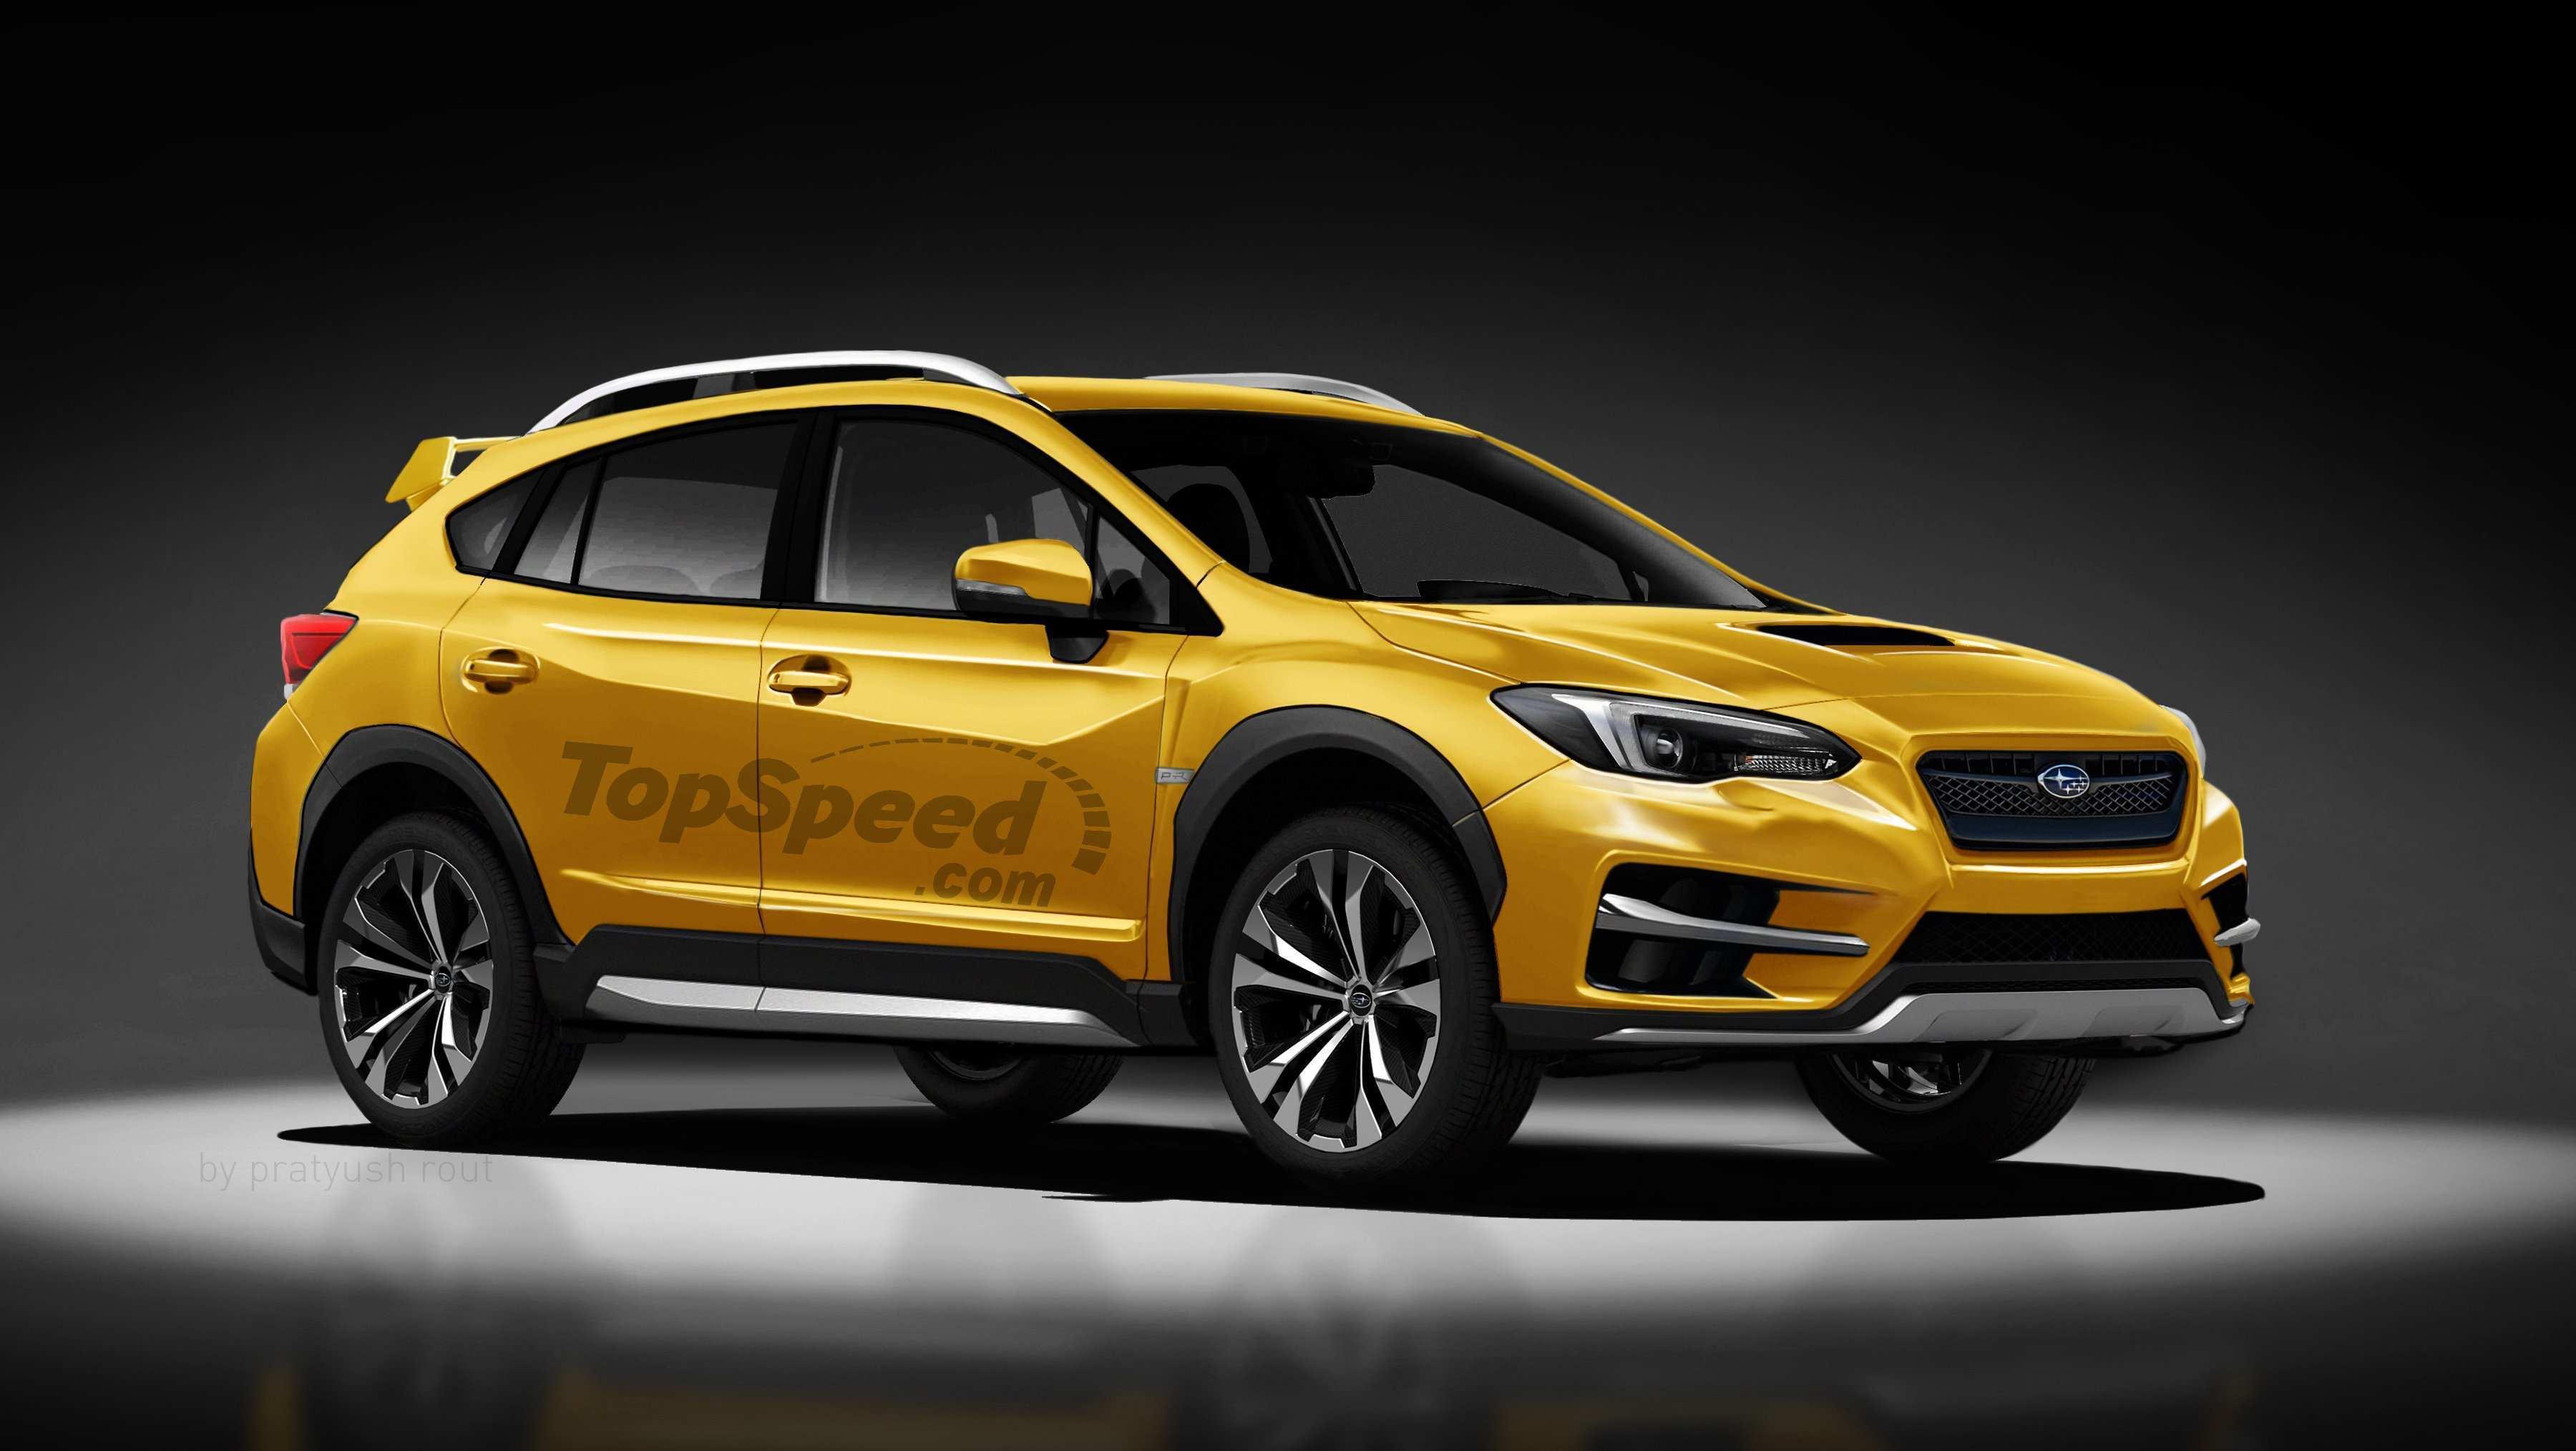 24 Great Subaru Lineup 2020 First Drive with Subaru Lineup 2020